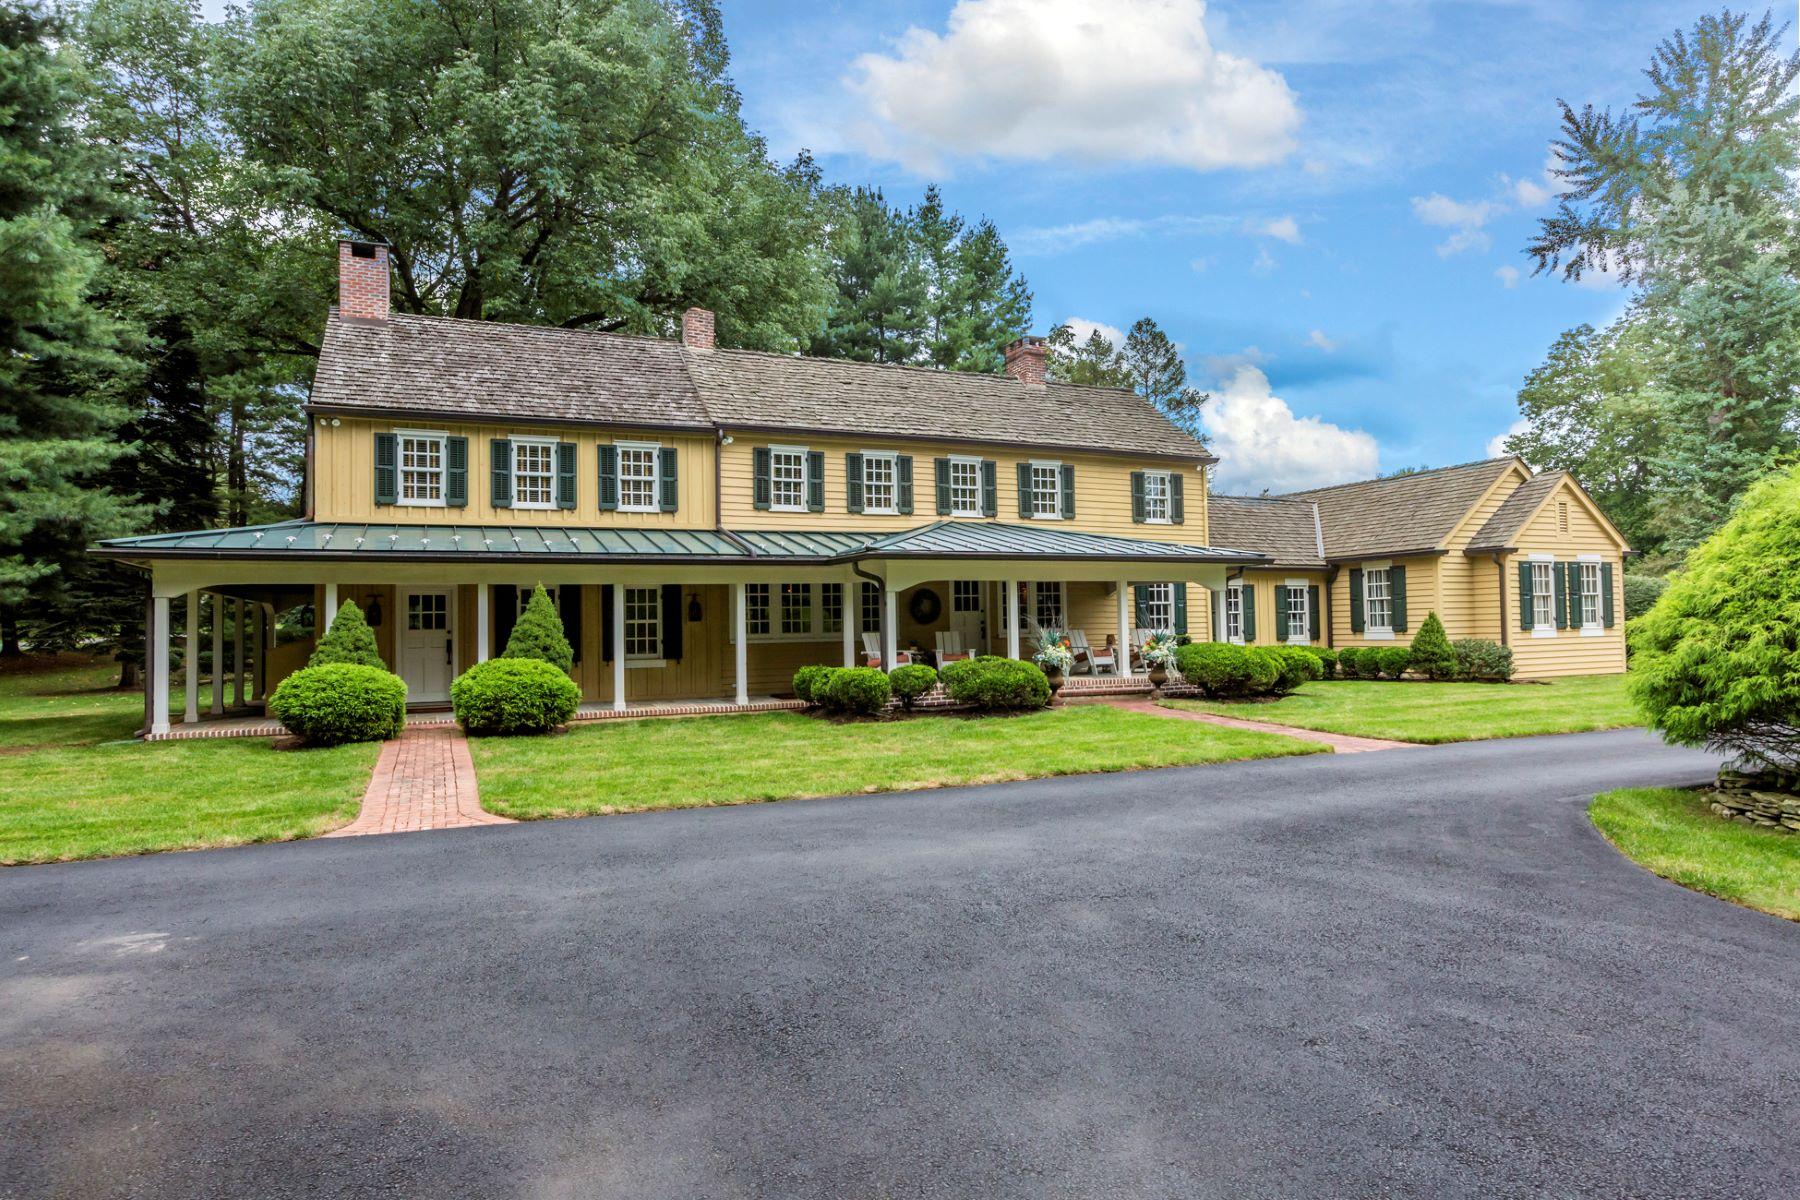 Single Family Home for Sale at True Bucks County Flavor 114 Cedar Glen Drive, New Hope, Pennsylvania 18938 United States